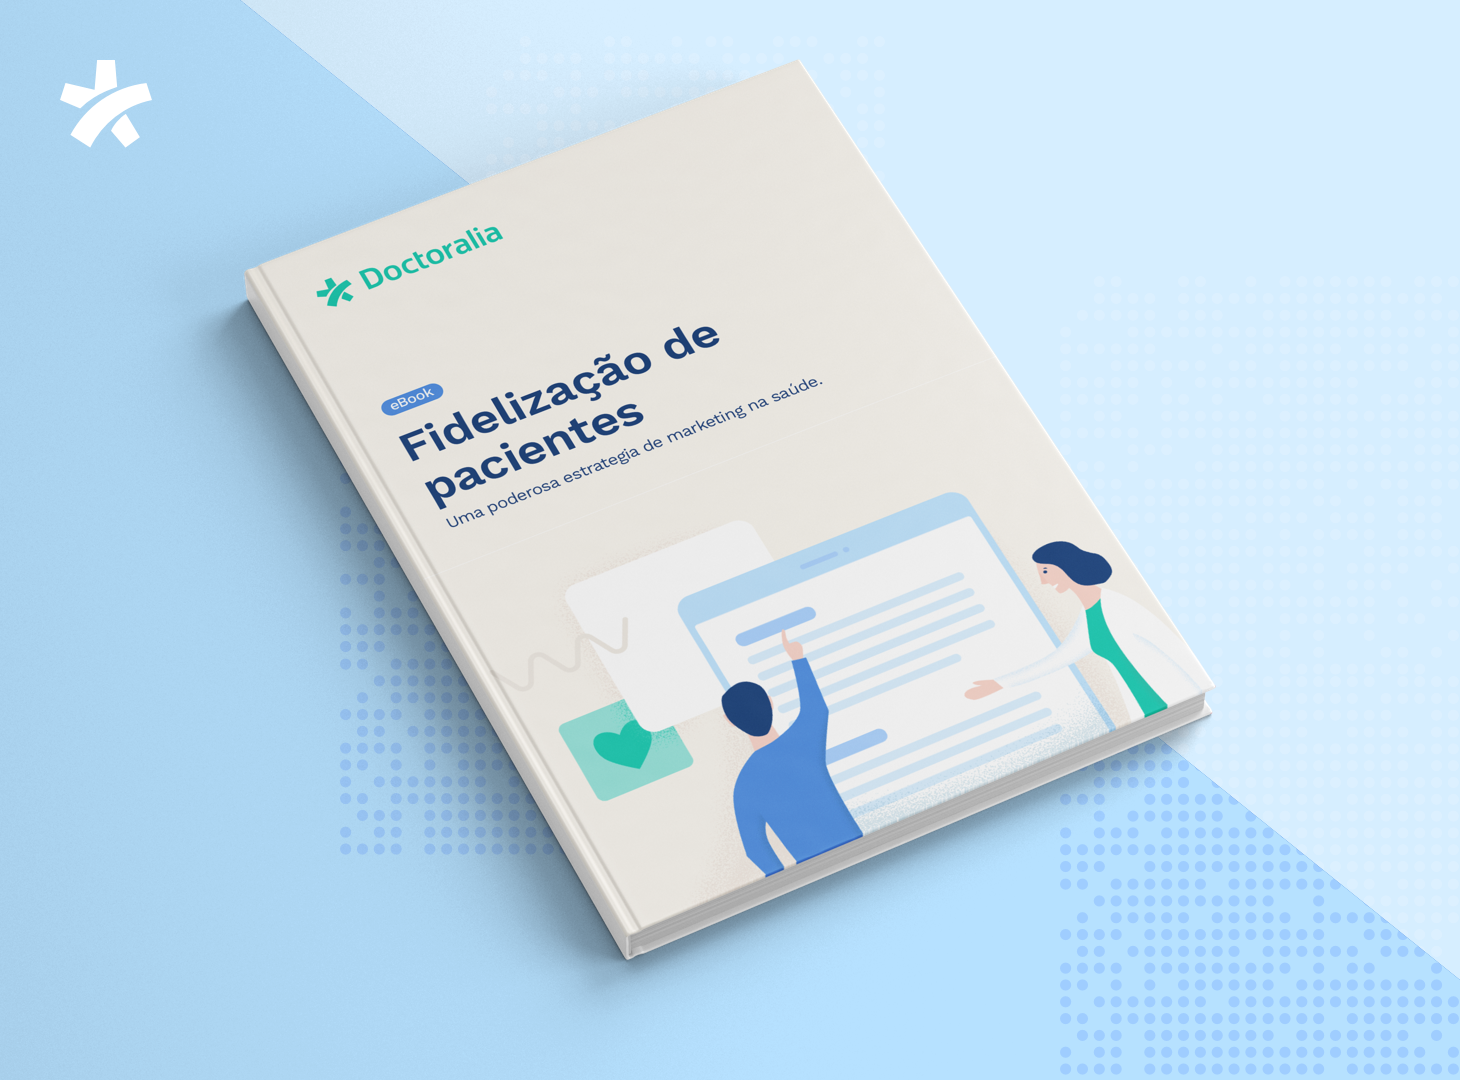 shareable-br-ebook-fidelizacao-pacientes-mockup-bg-blue-1